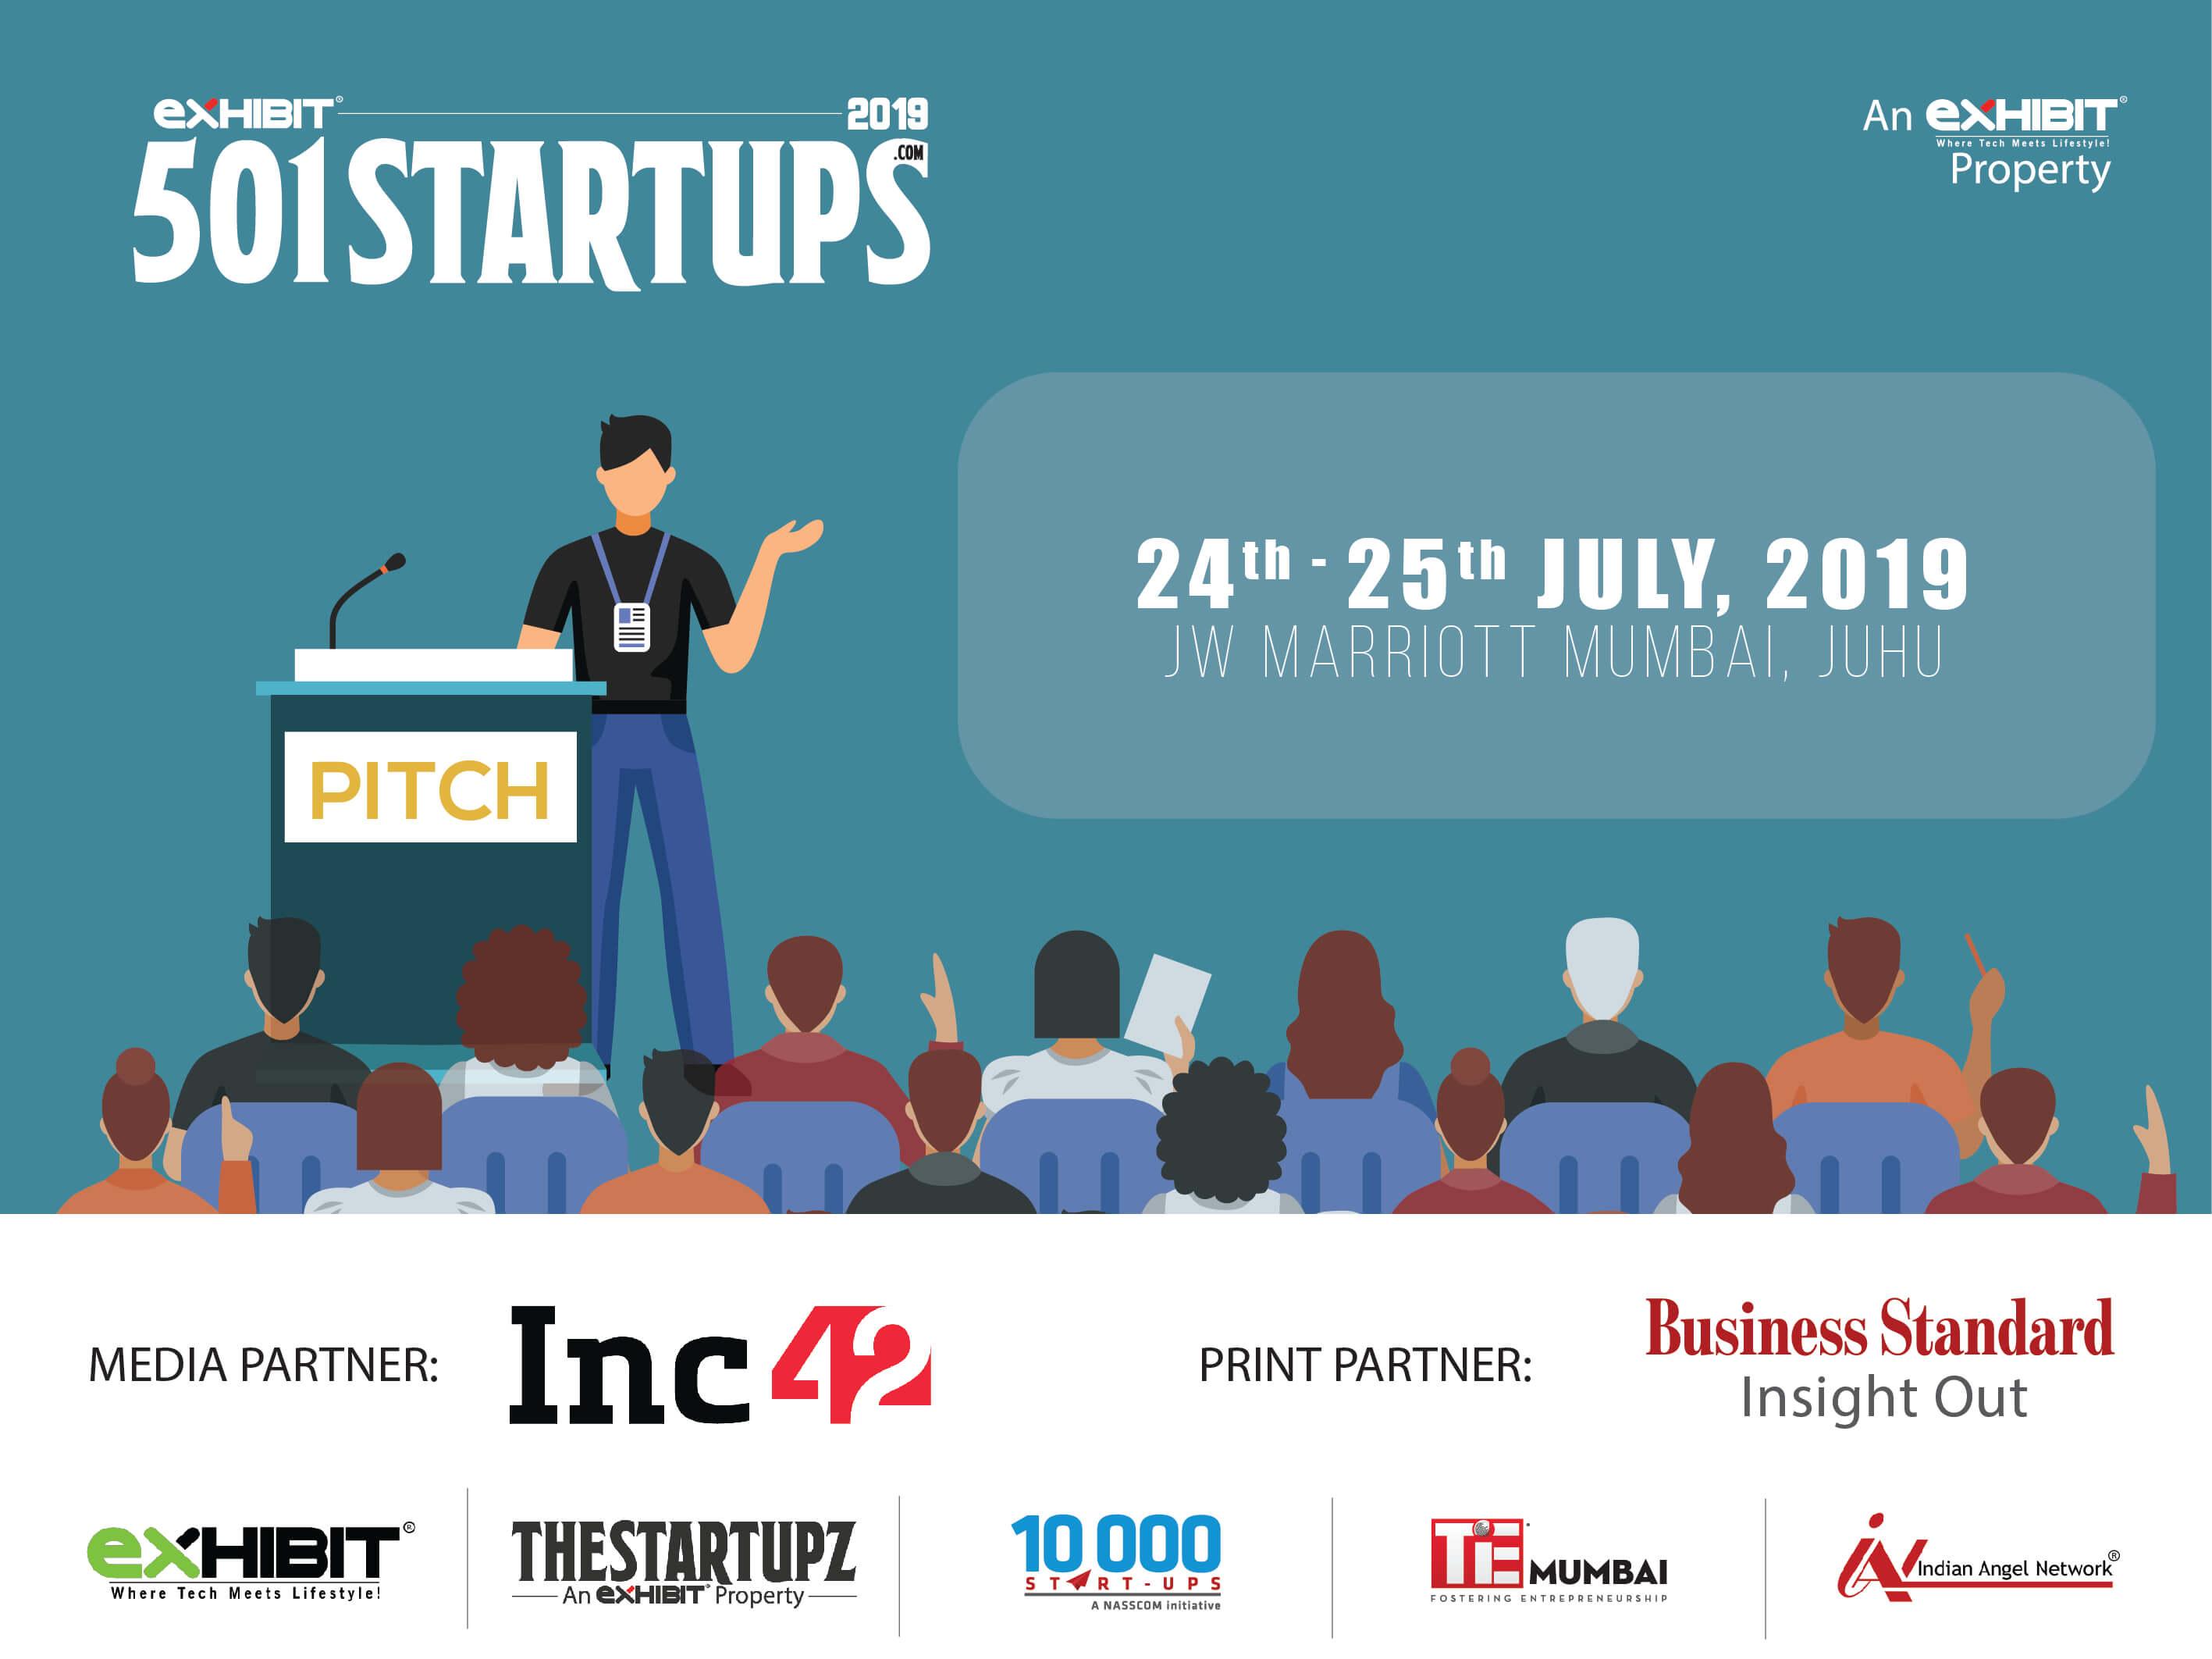 Exhibit 501 Startups 2019